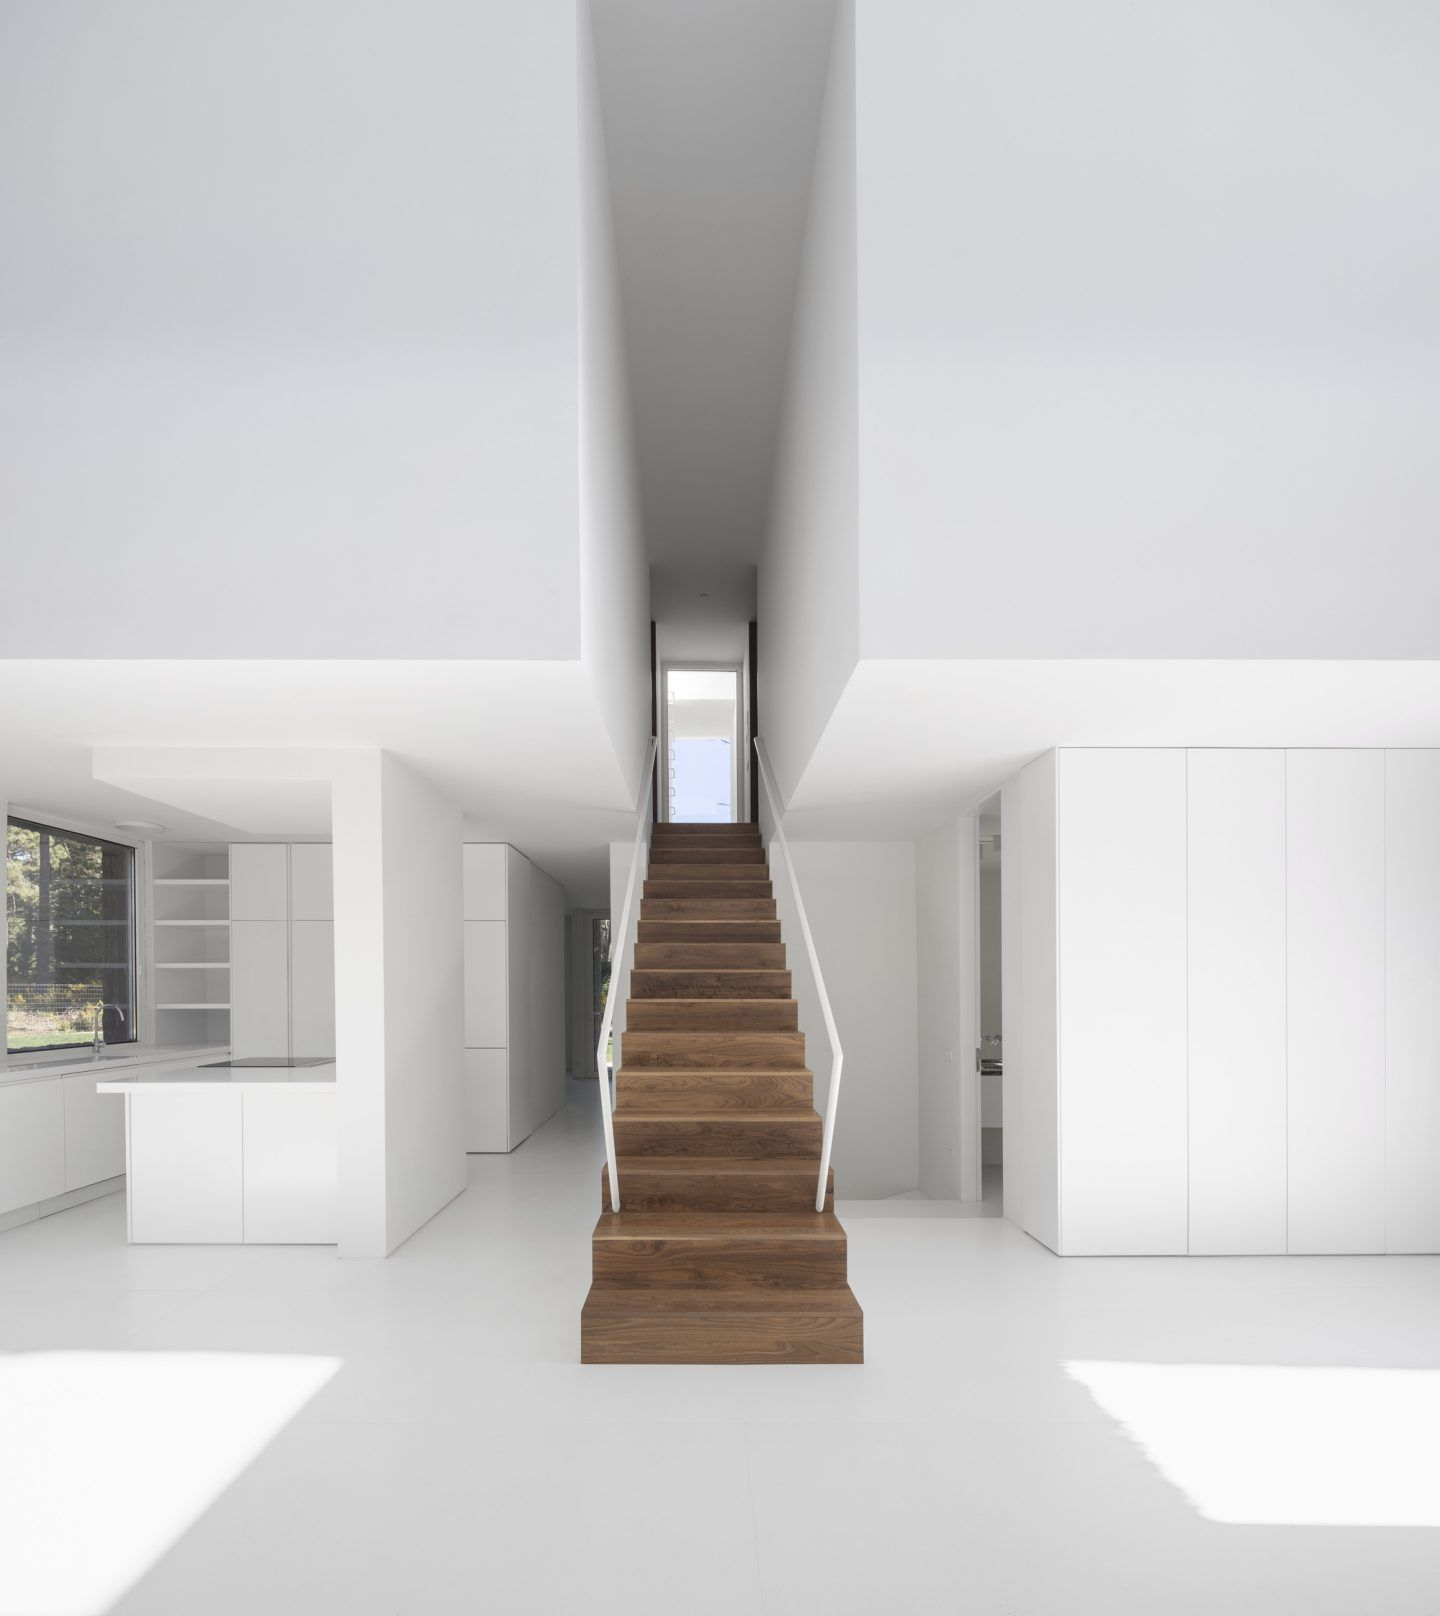 IGNANT-Architecture-Bica-Arquitectos-Herdade-da-Aroeira-House-010